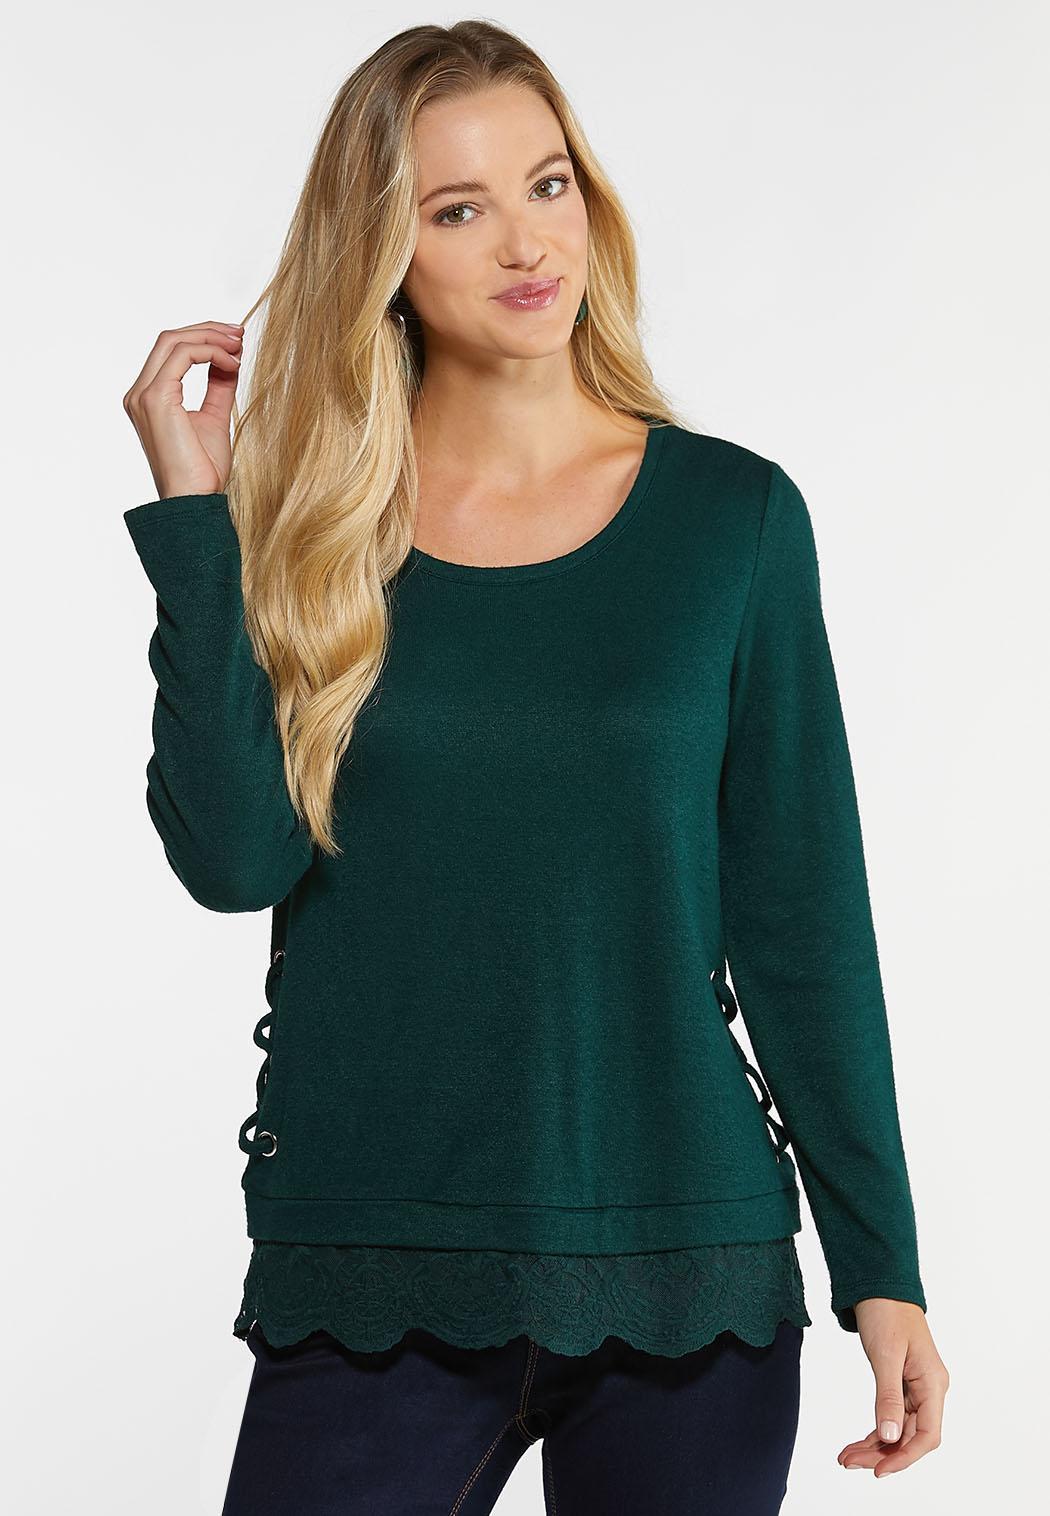 Green Lace Trim Top